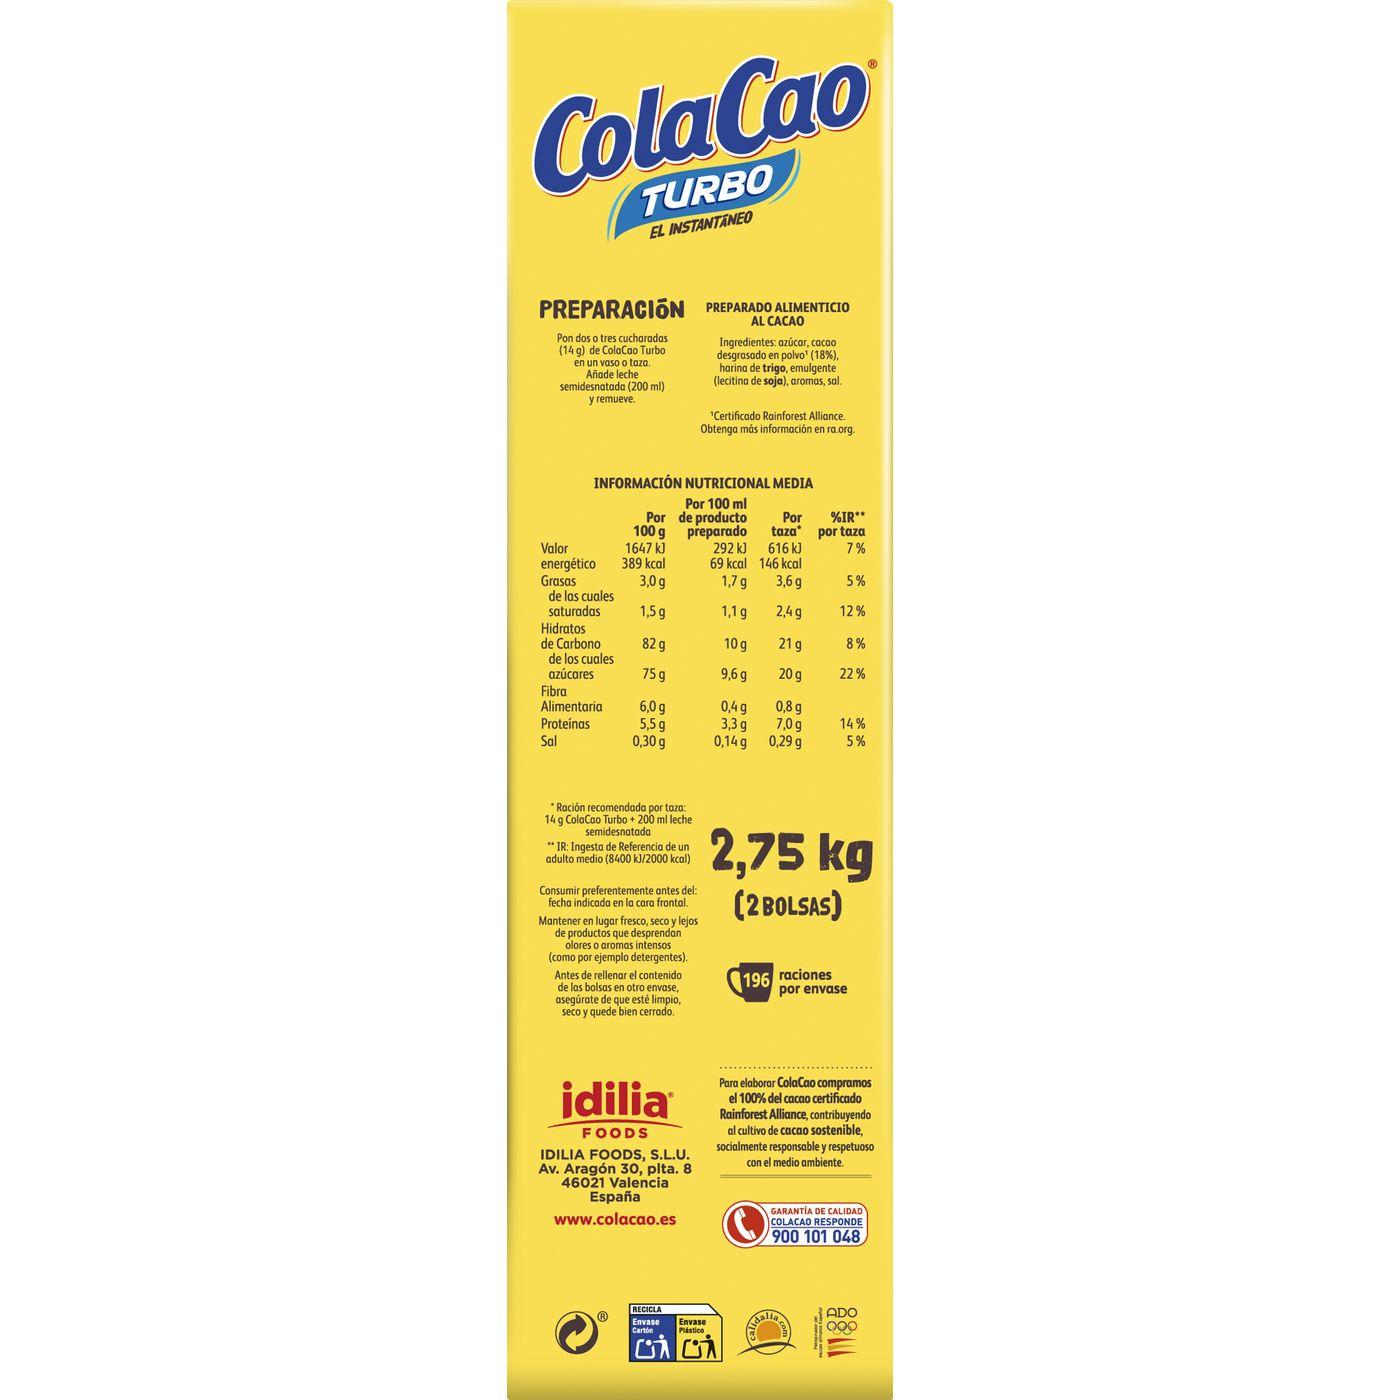 Cacao soluble COLACAO Turbo, maleta 2,750 kg